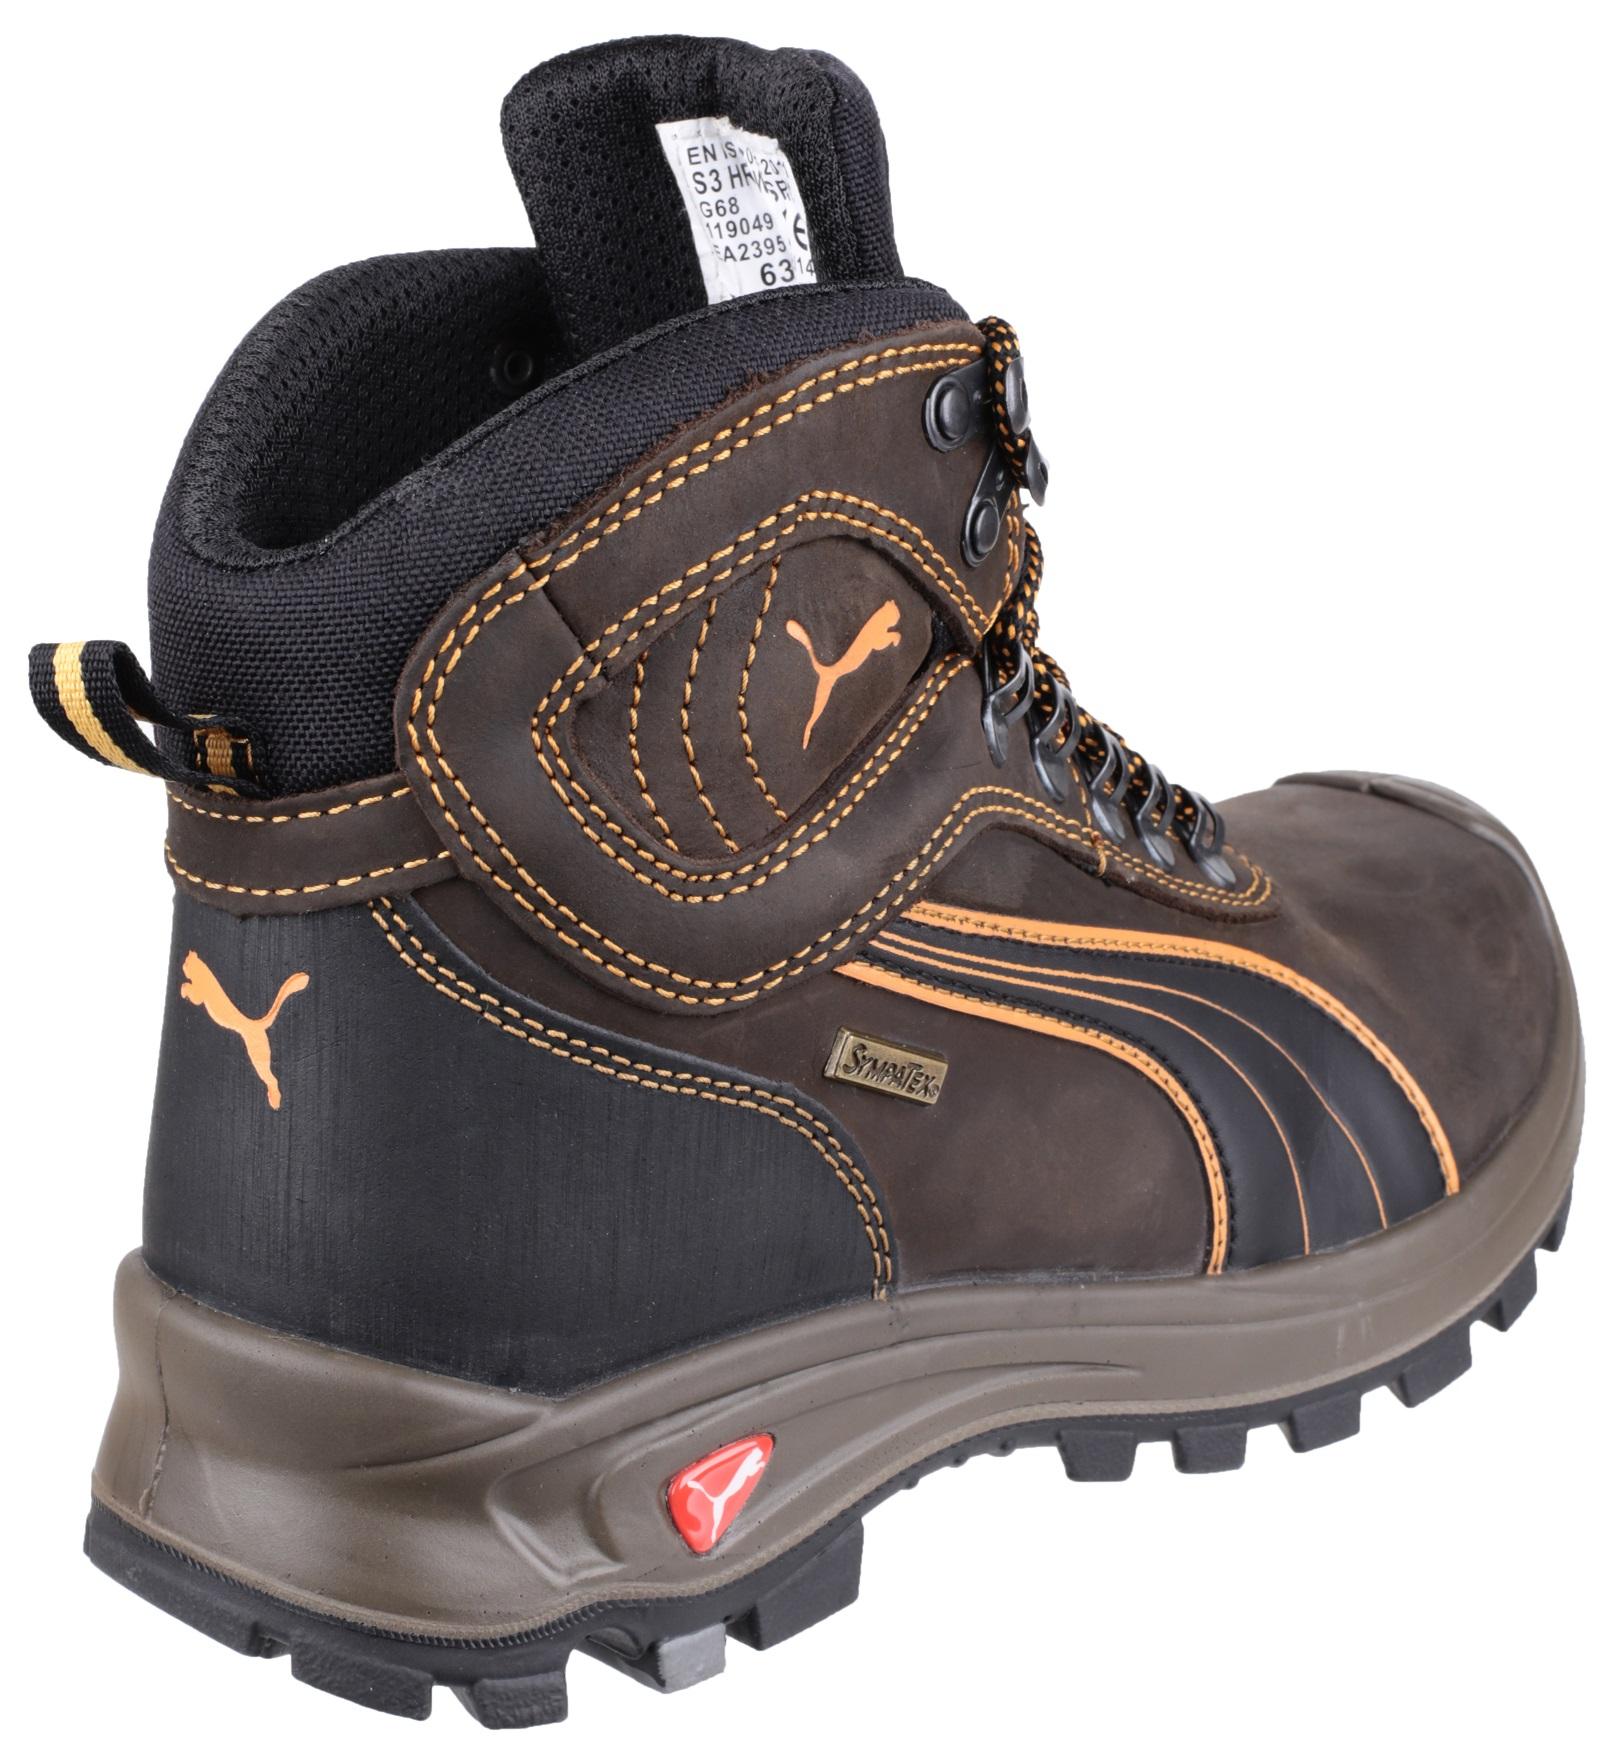 best website 1a76d c0c75 Puma Sierra Nevada Mid Safety Boots